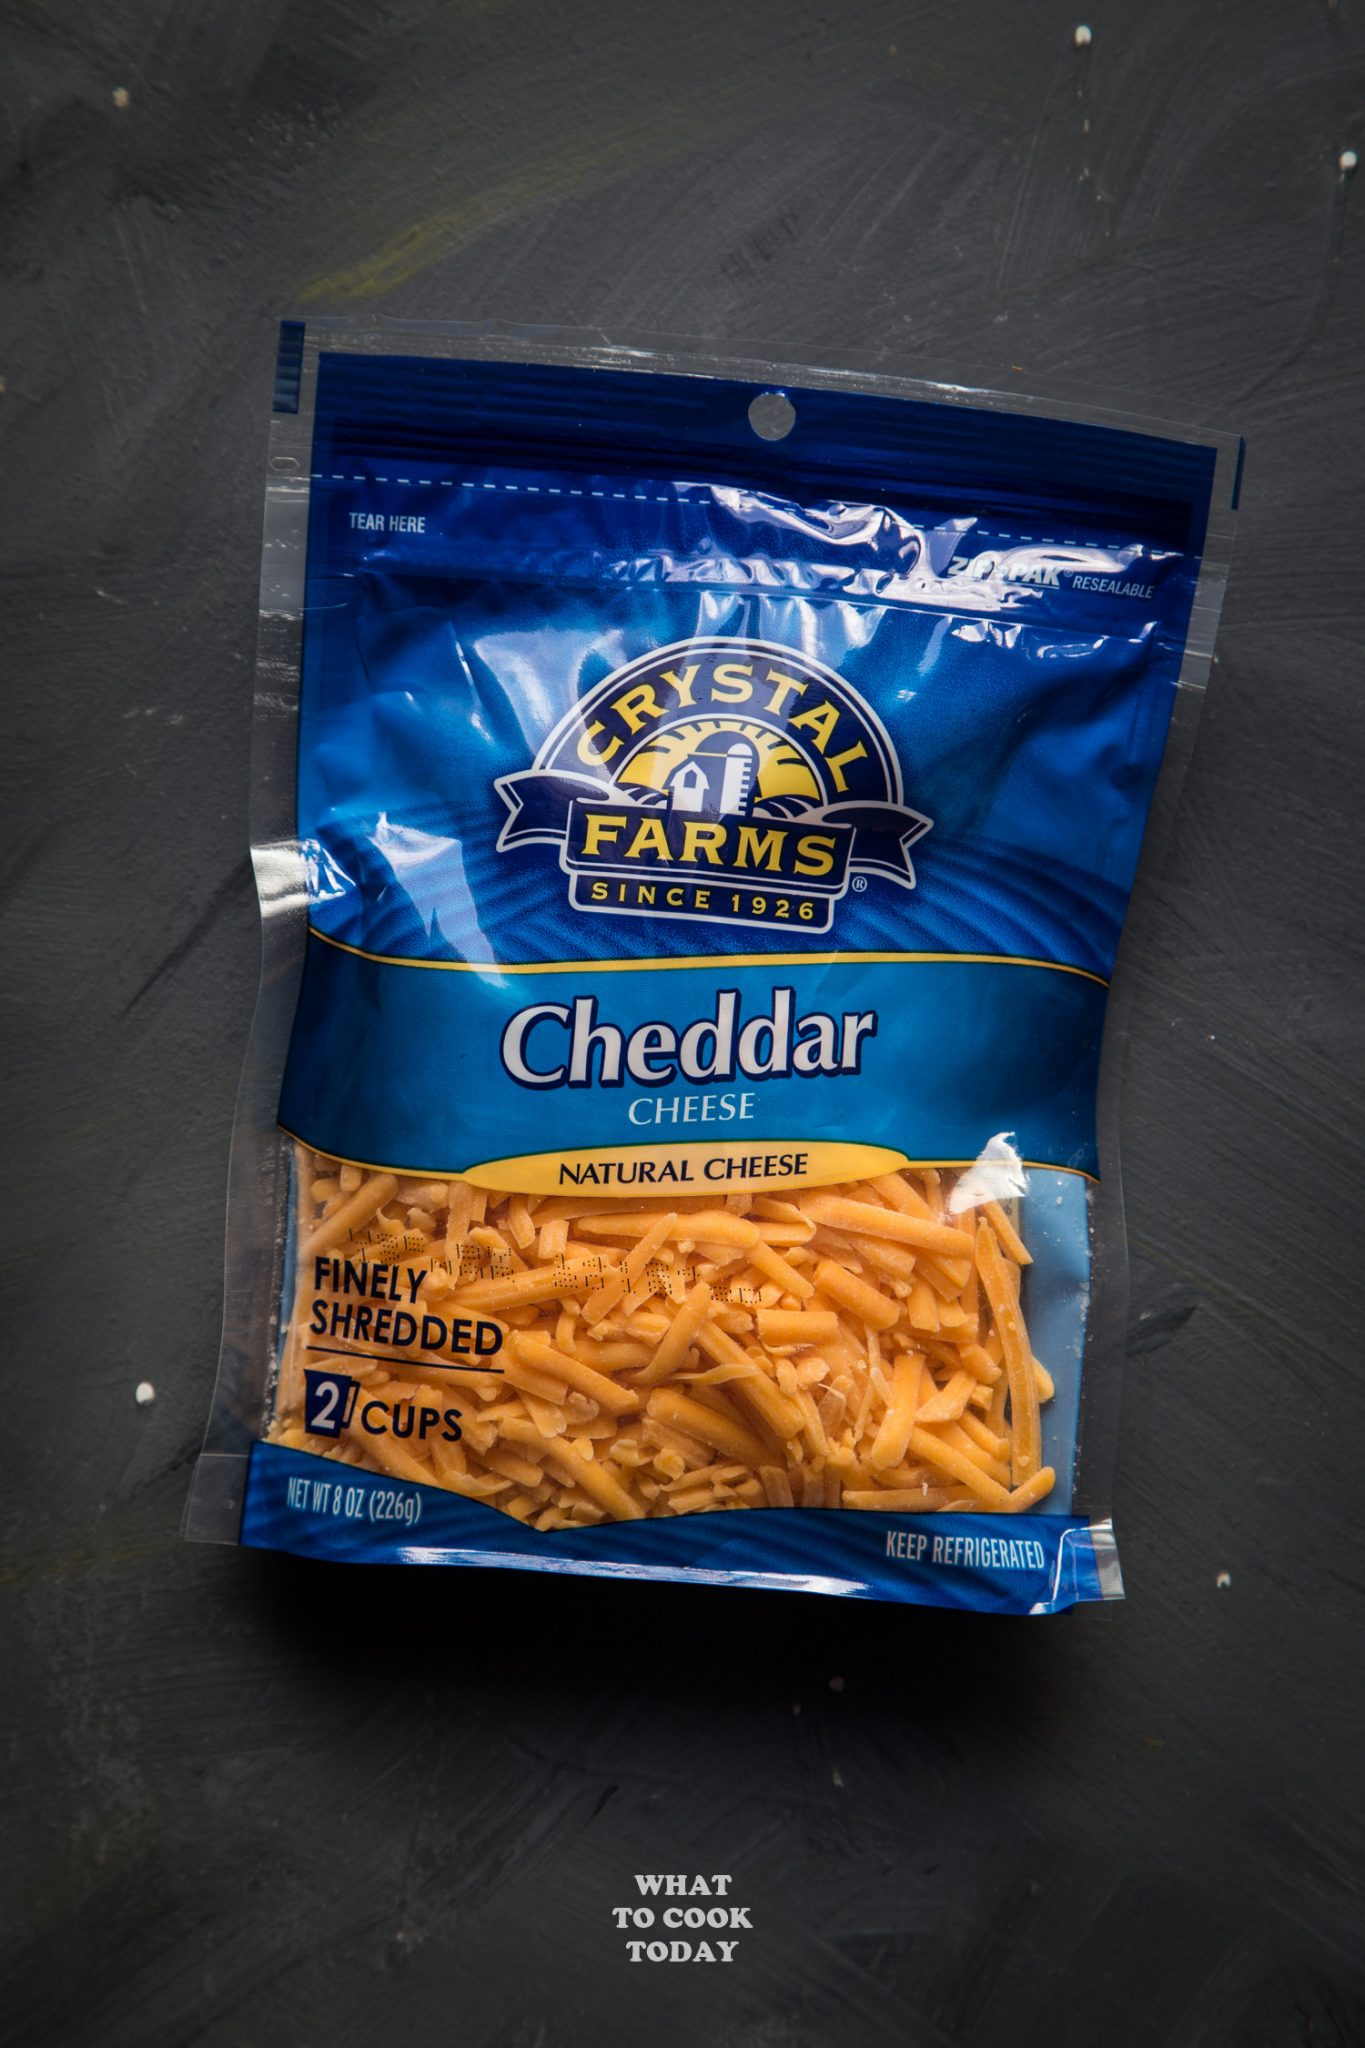 Crystal Farm Cheese#ad #CheeseLove